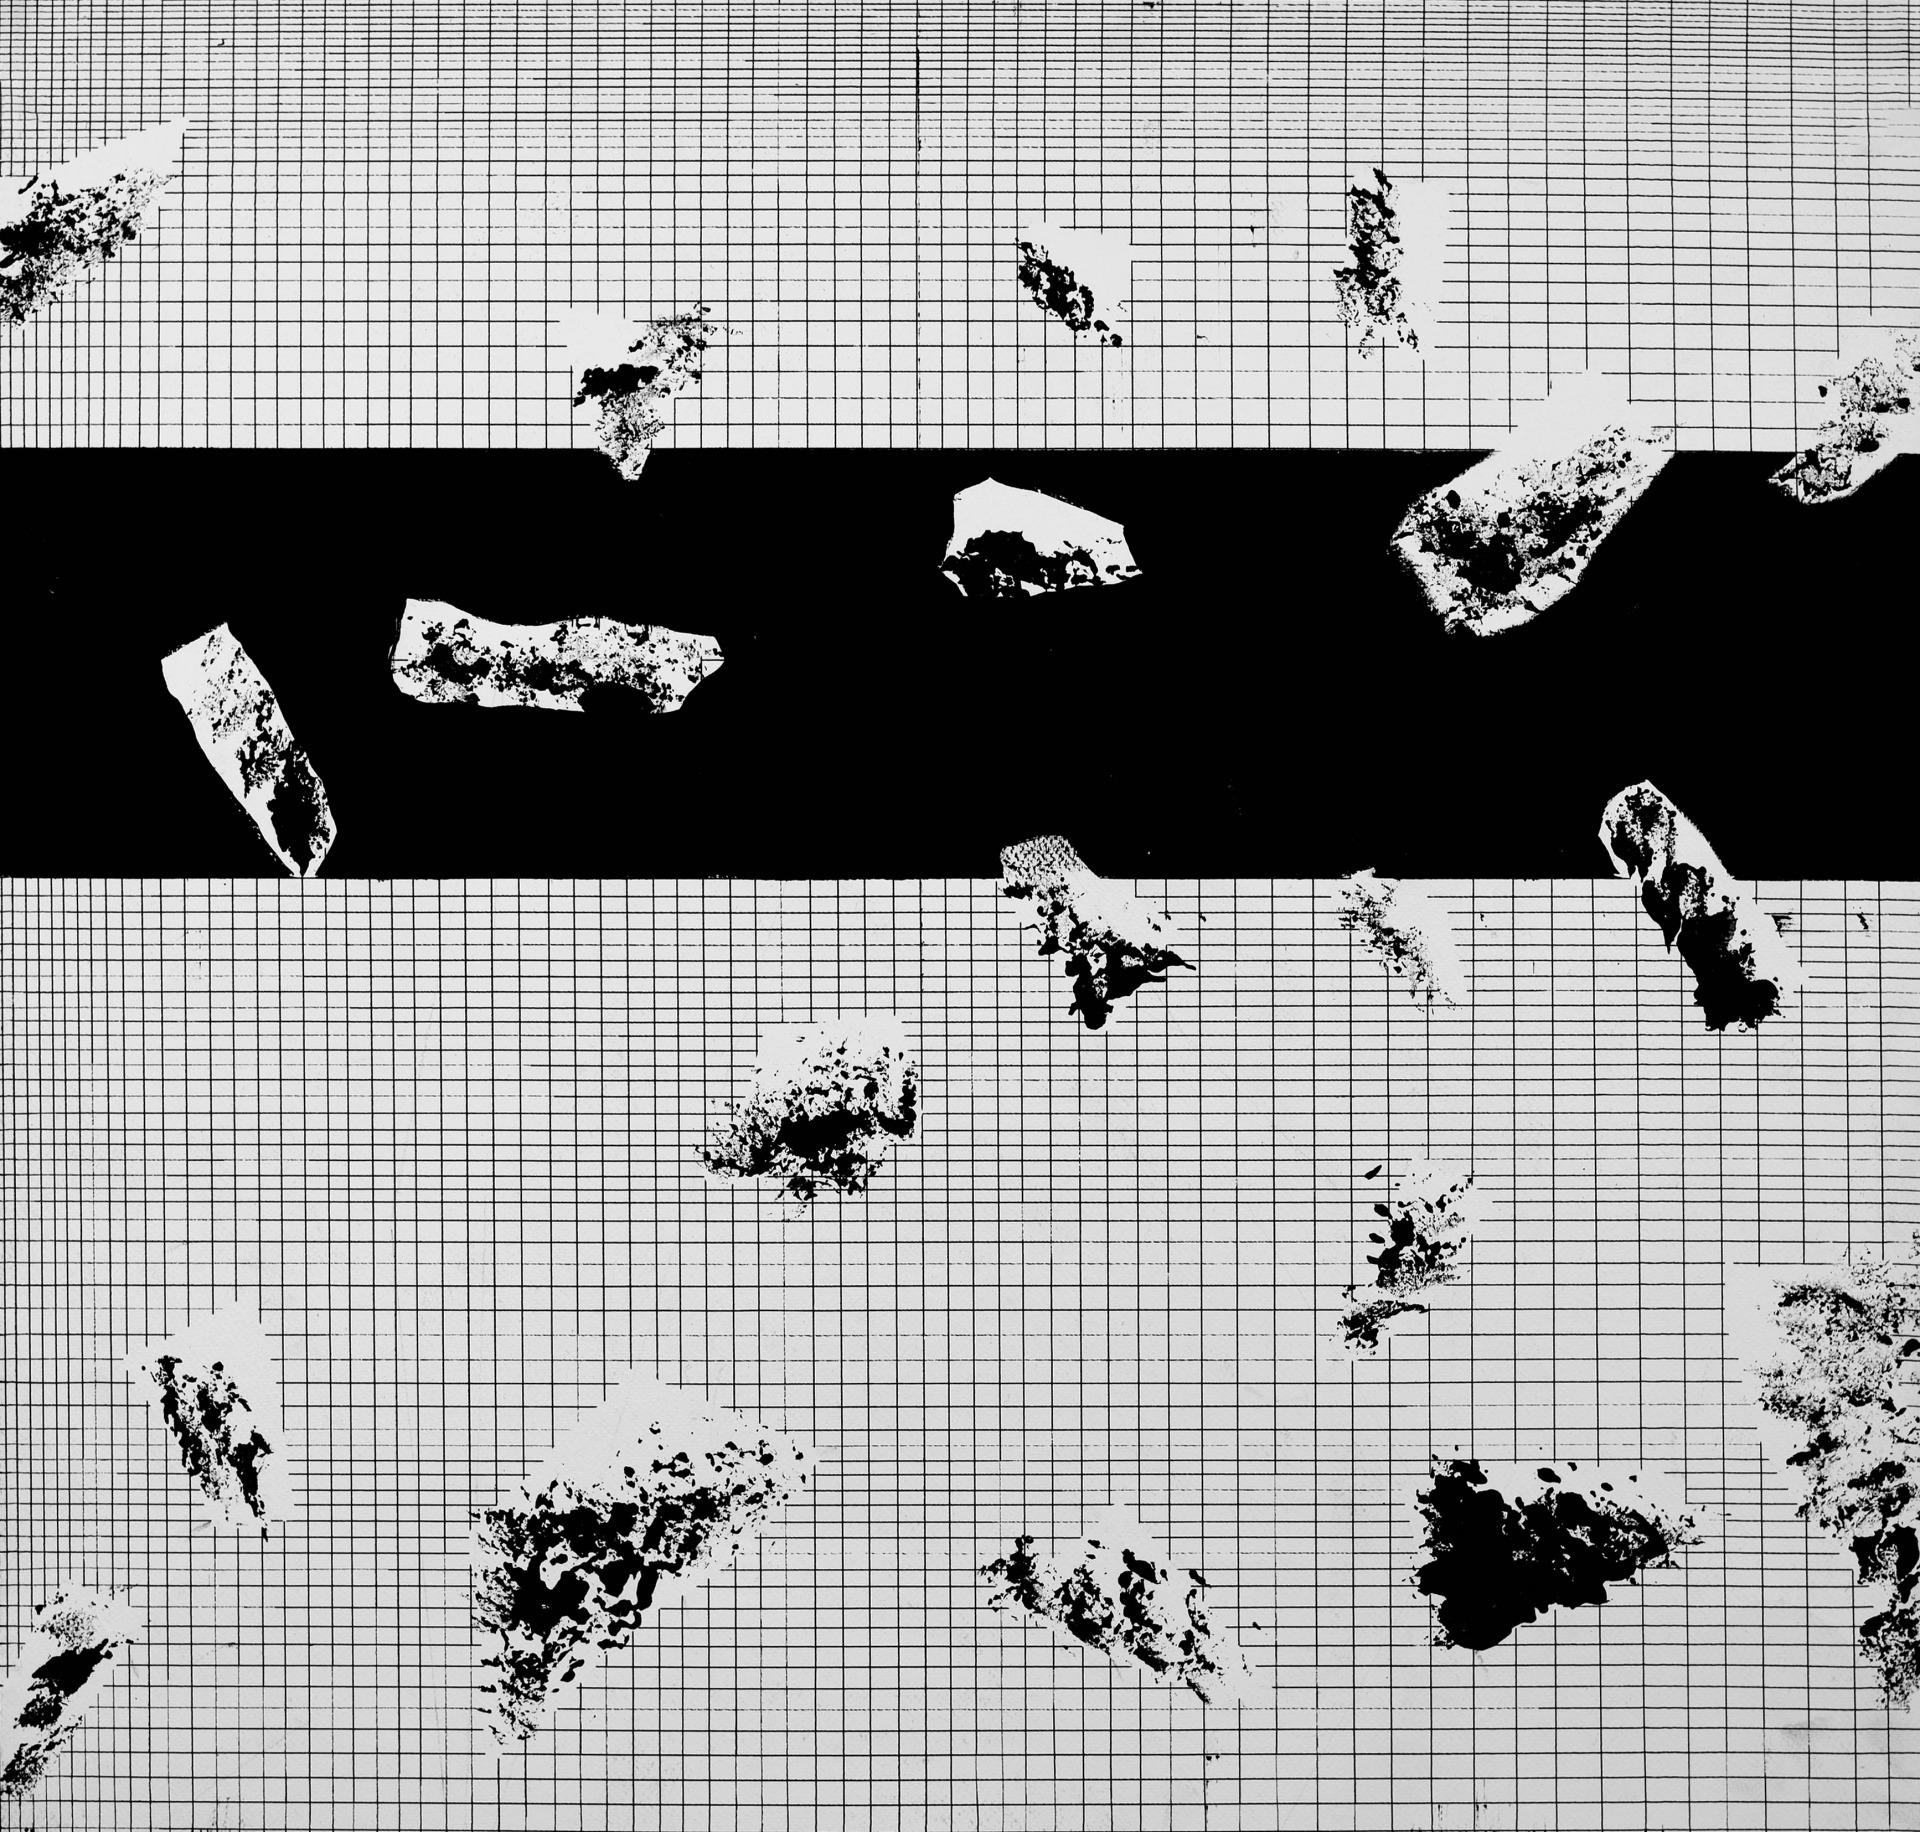 Contemporary art from Gyula Sági | op230521. 8